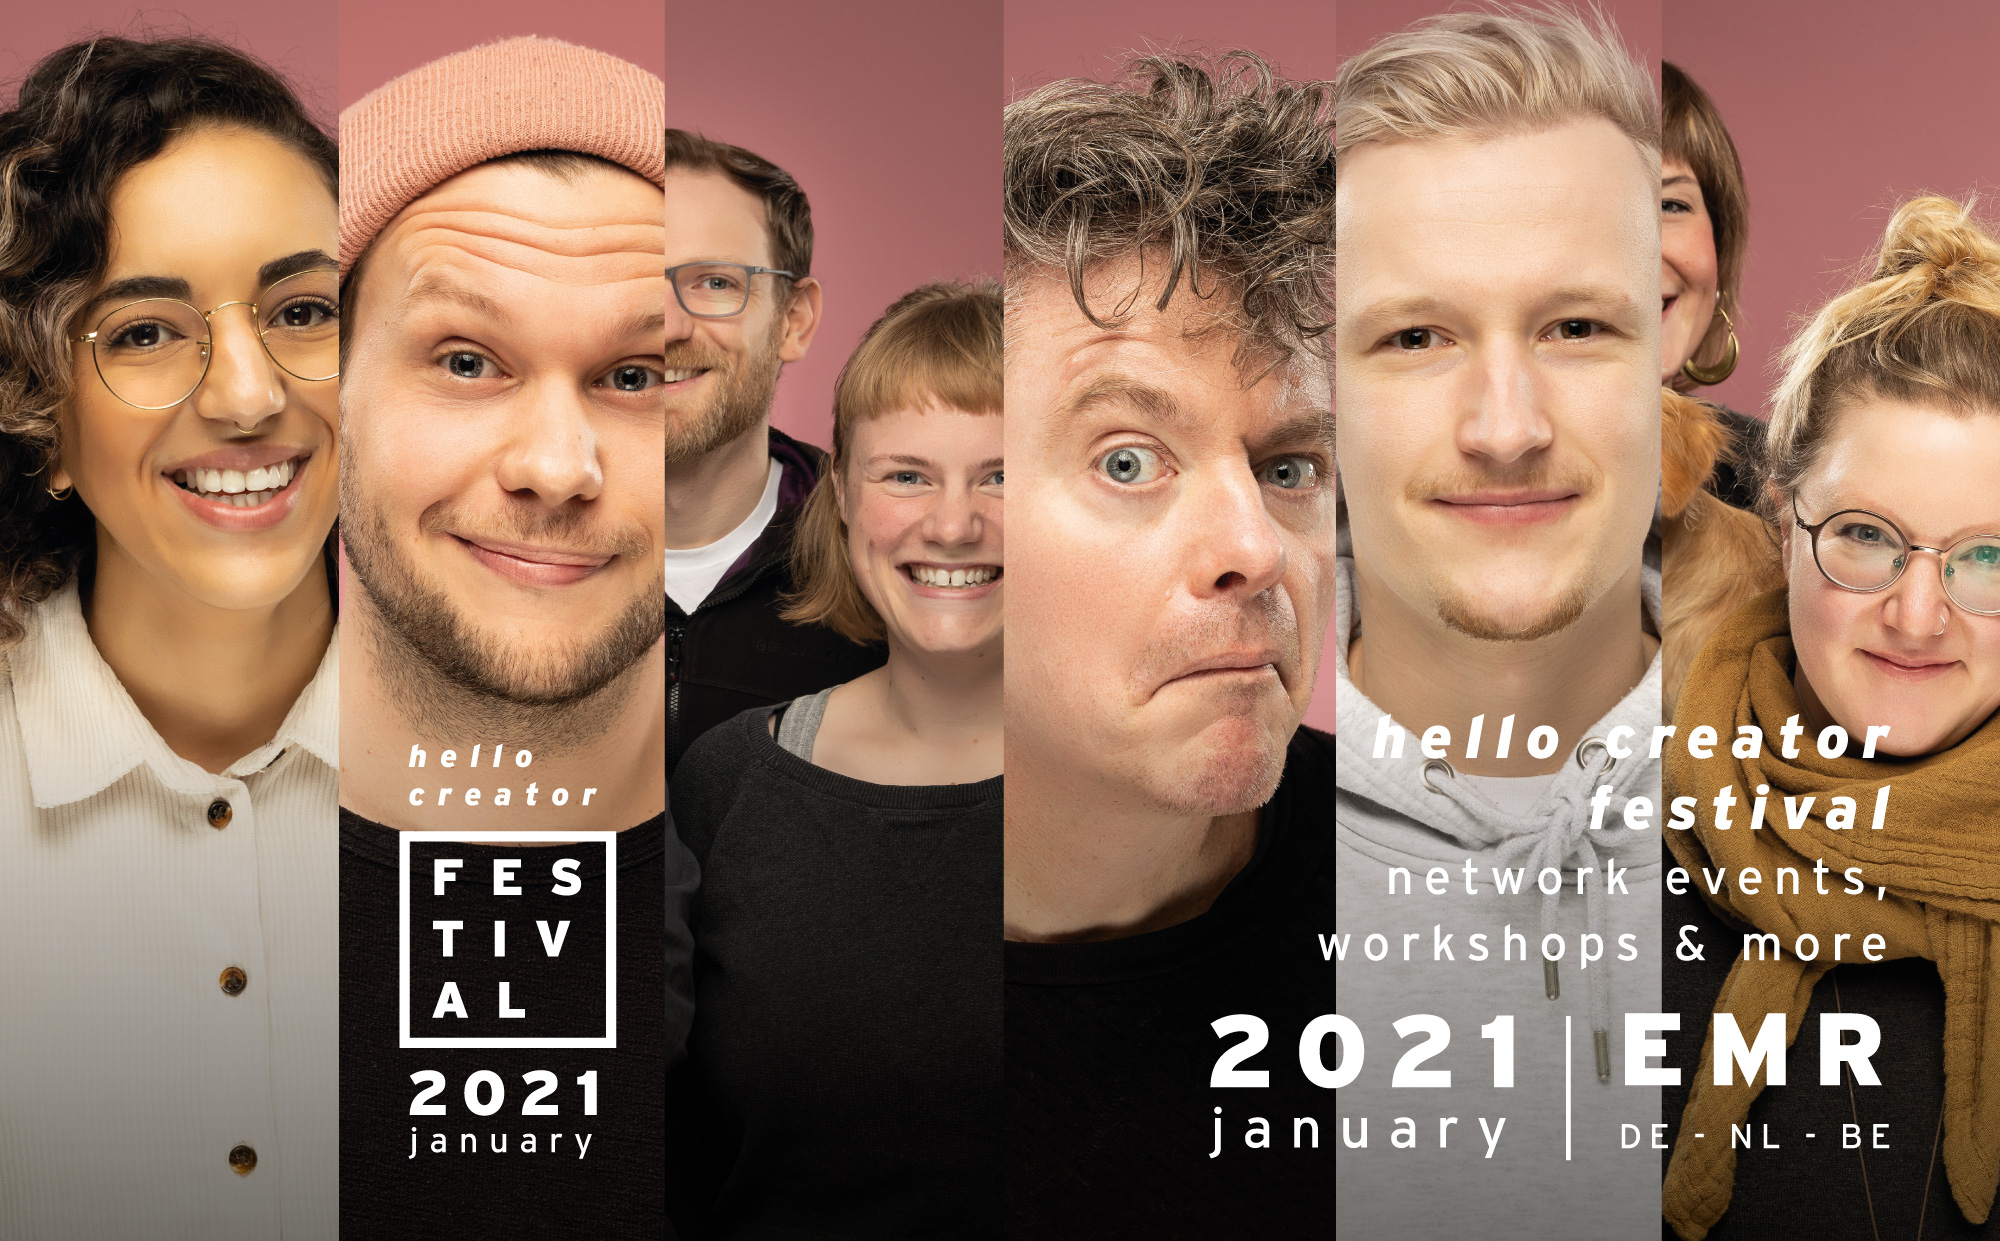 hello creator festival Januar 2021